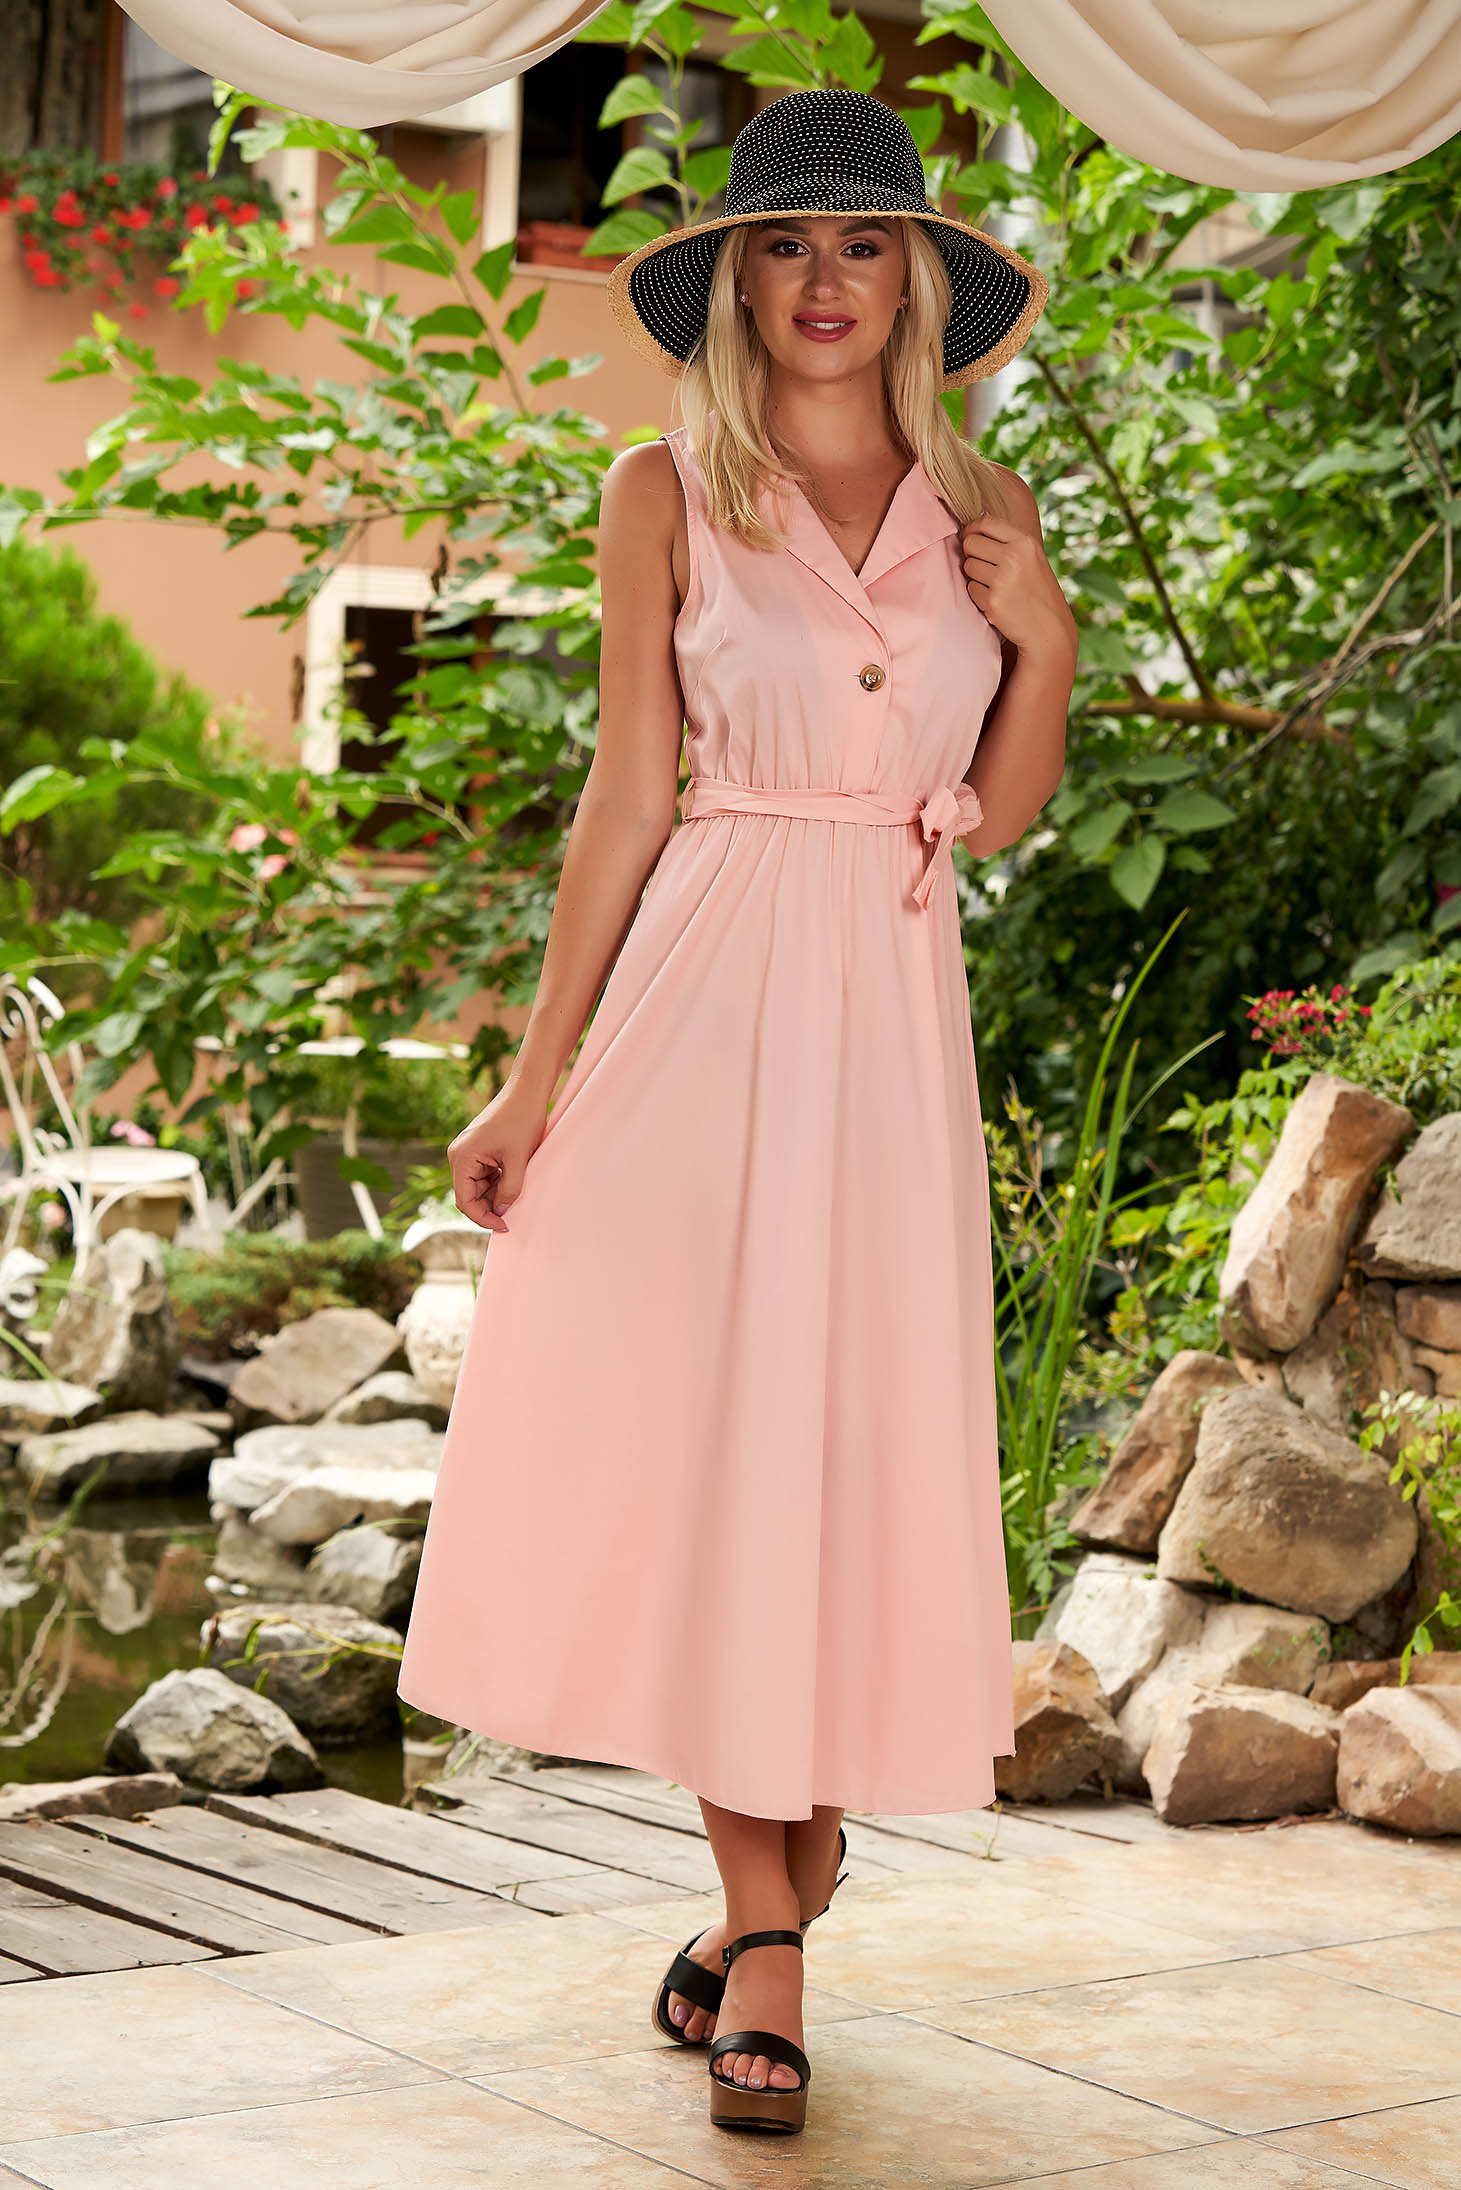 Rochie SunShine roz deschis midi de zi din bumbac in clos cu elastic in talie si cordon detasabil